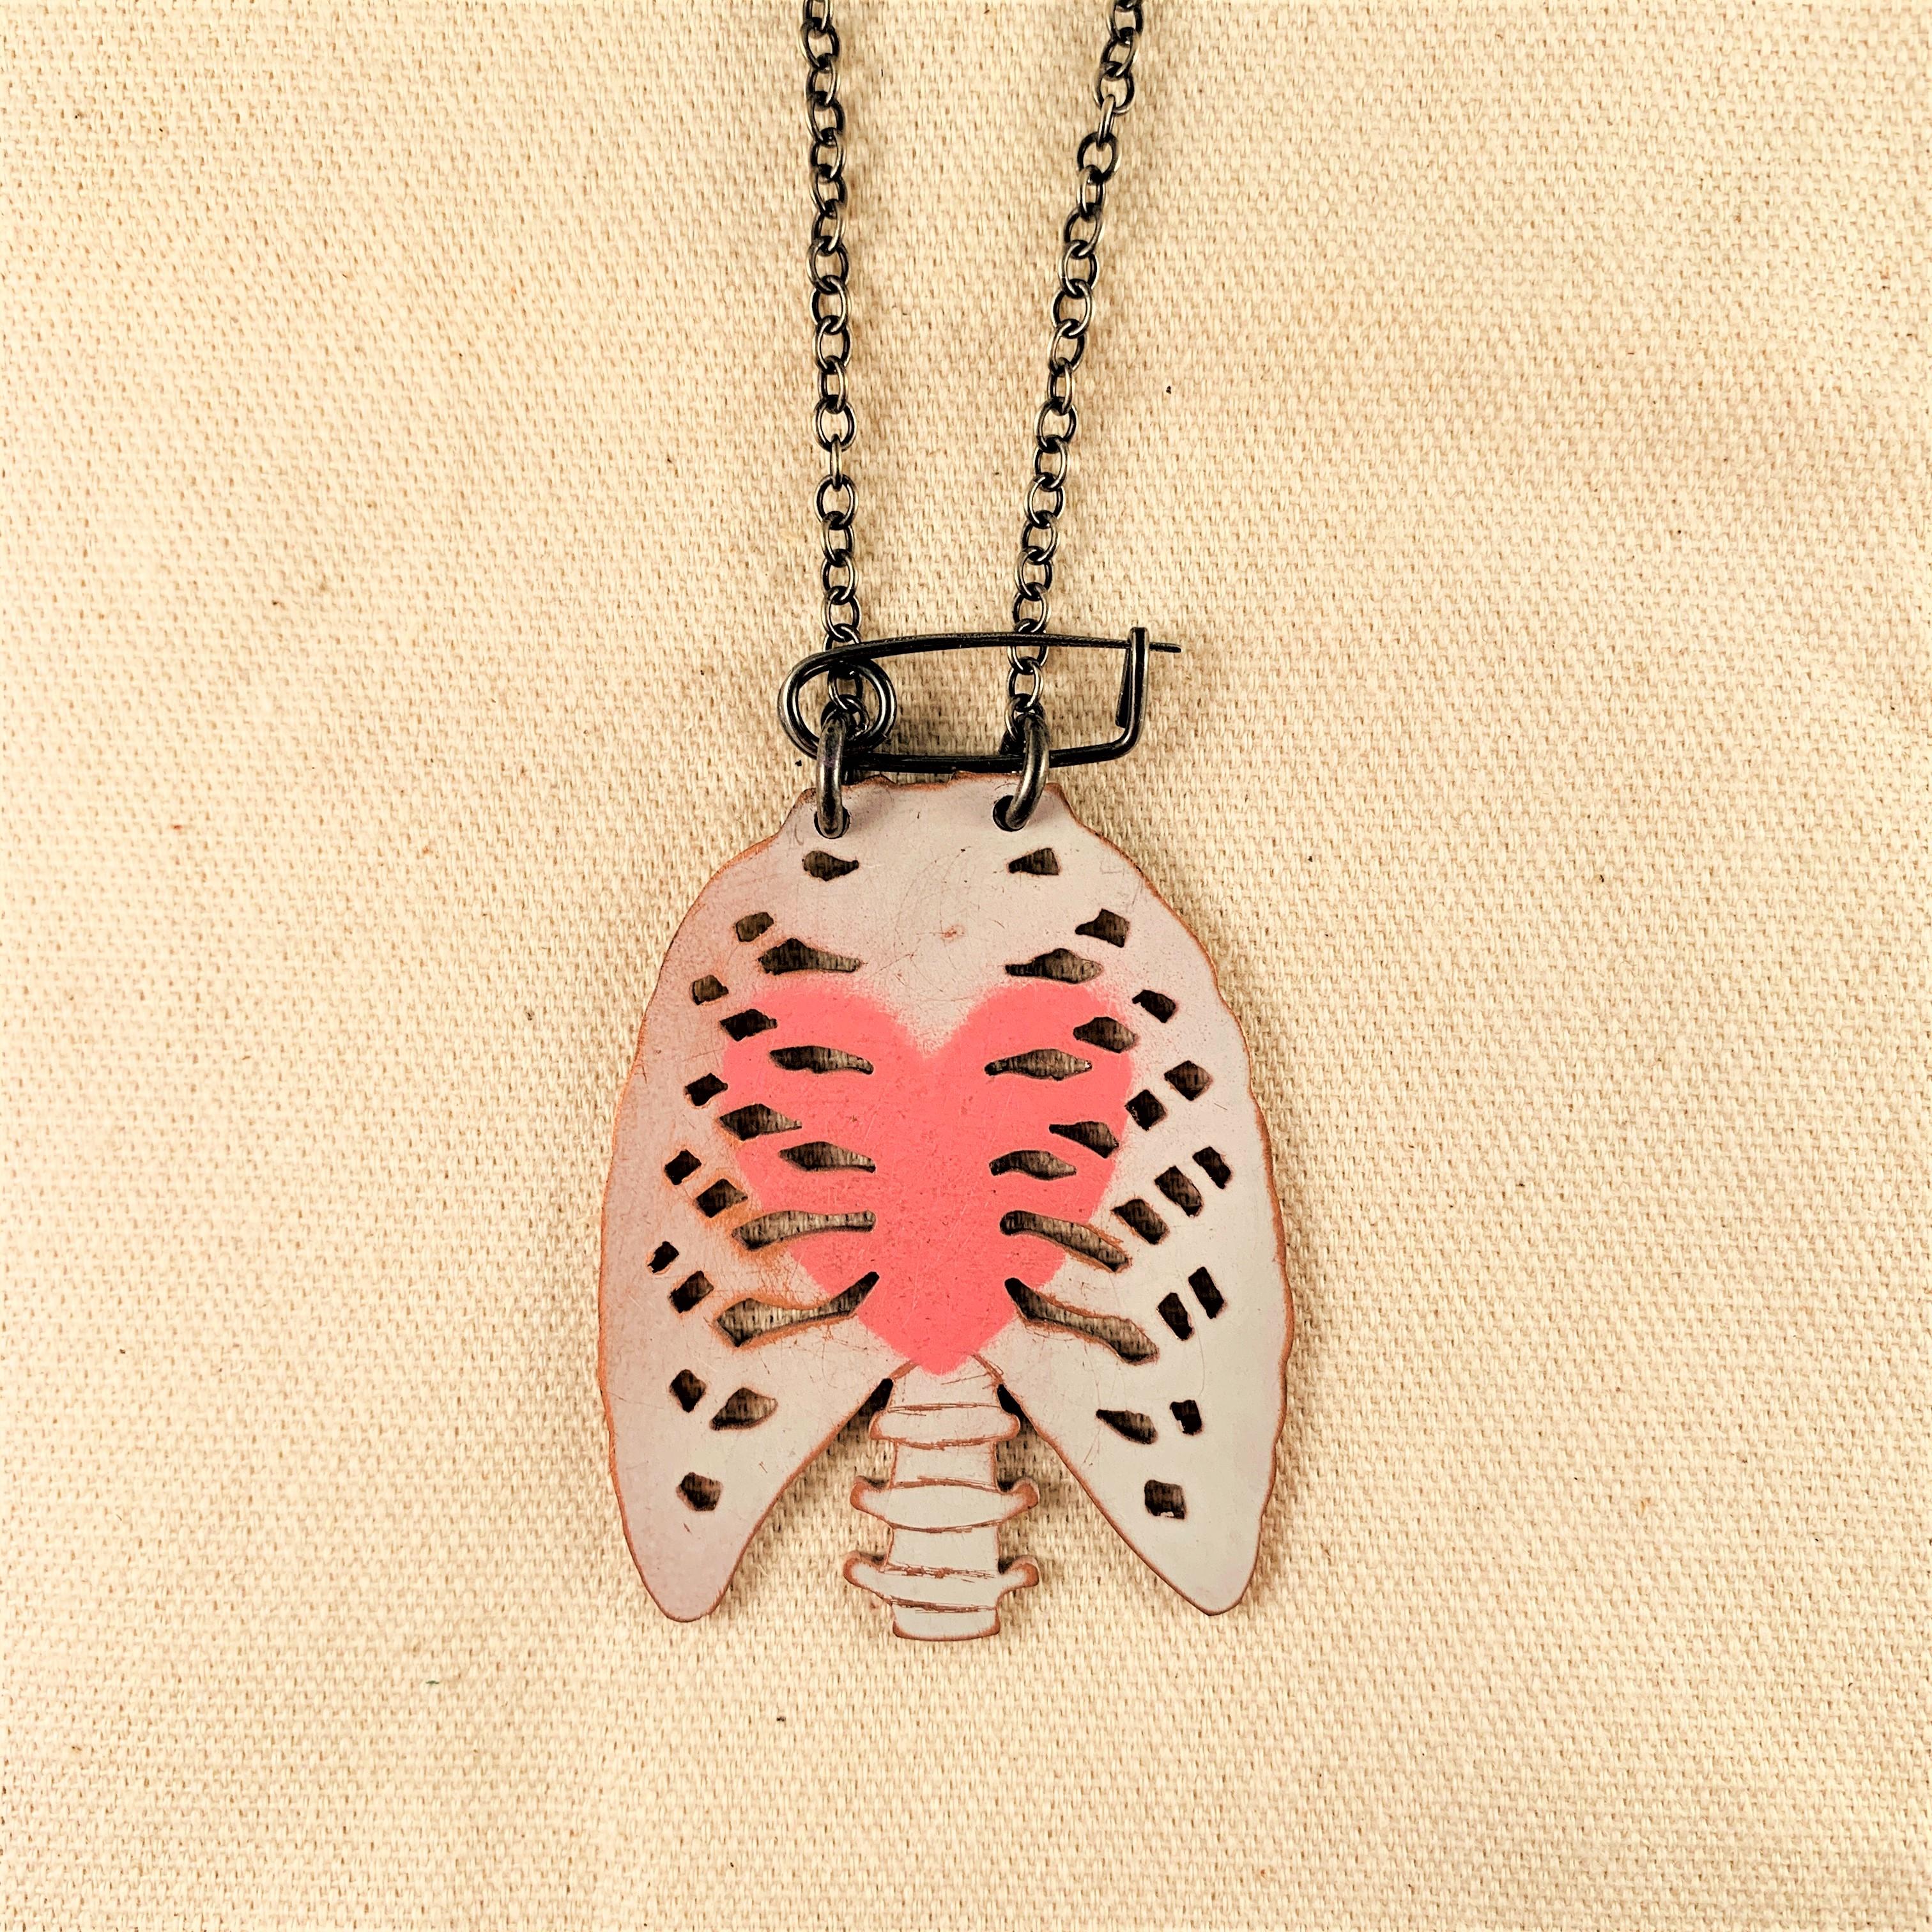 Anna Watson - Small Ribcage Necklace